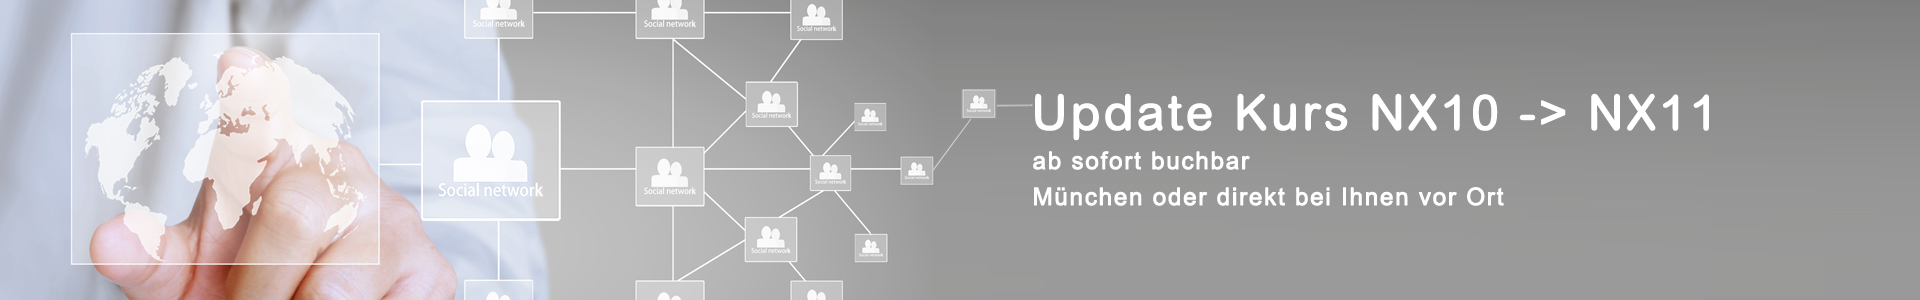 Update Kurs Siemens NX10 -> NX11